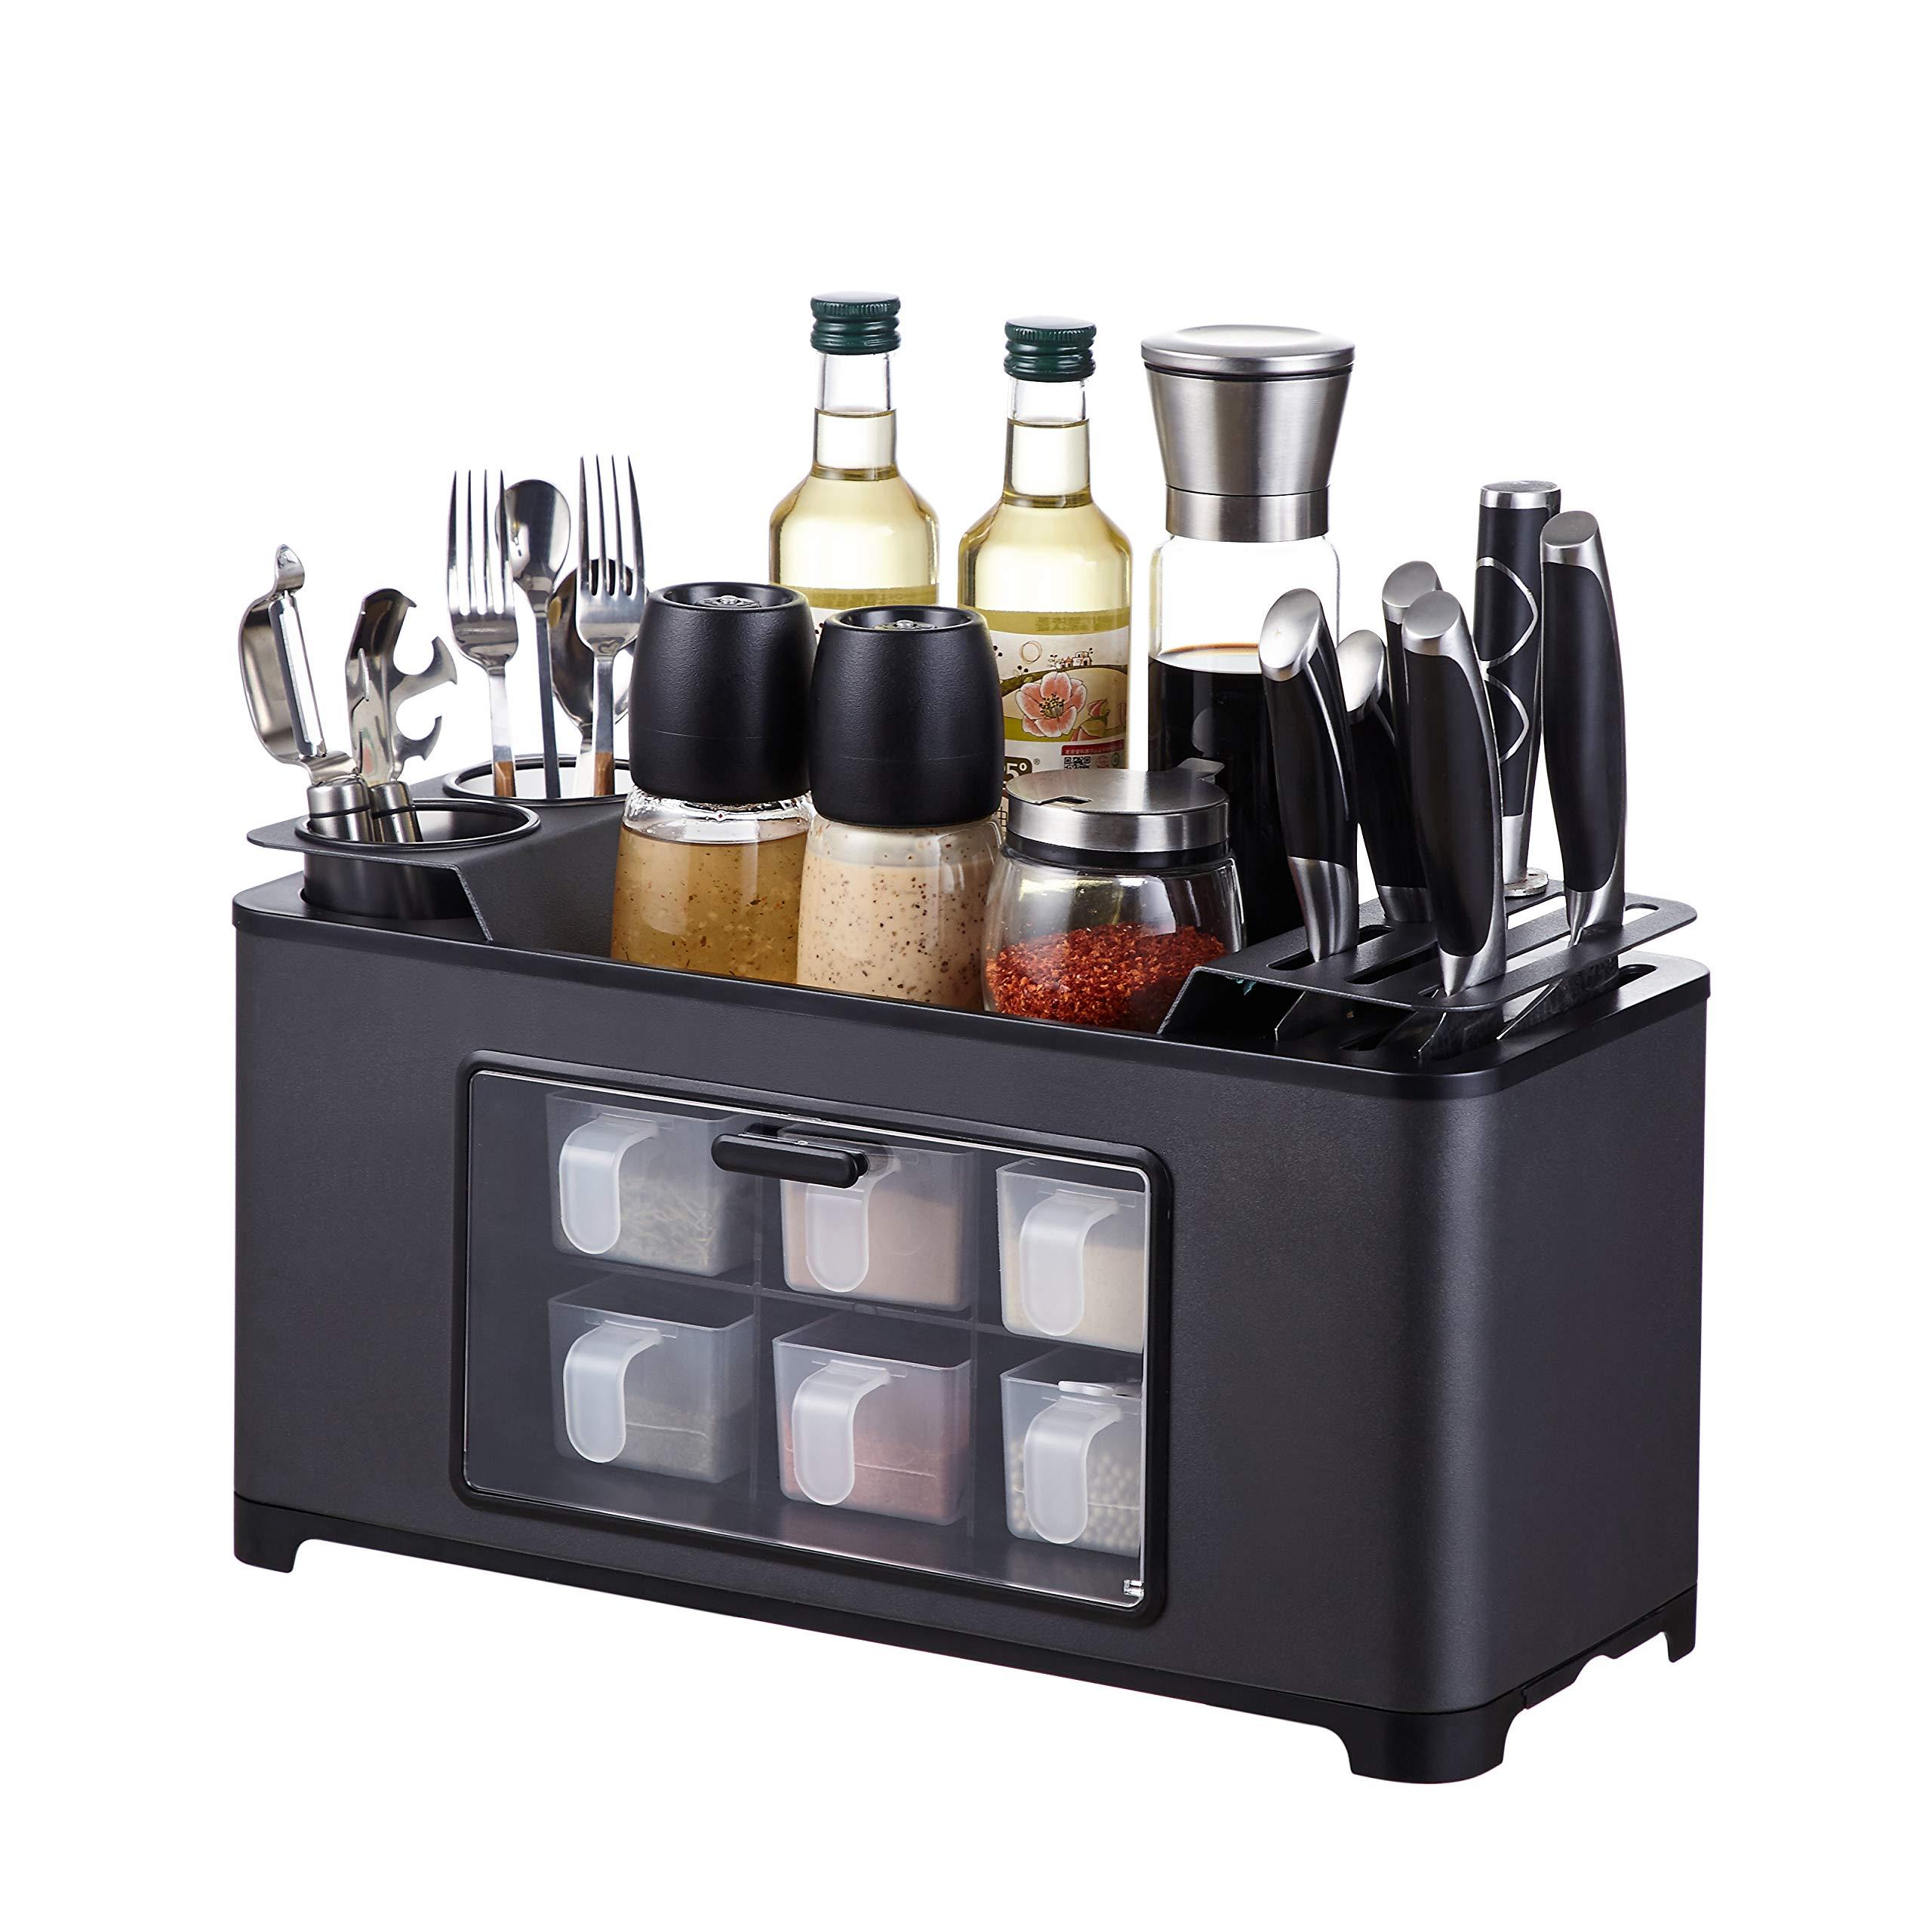 istBoom Spice Storage Box, Black Spice Holder Organizer Rack with Utensil Caddy Knife Holder for Kitchen Pantry